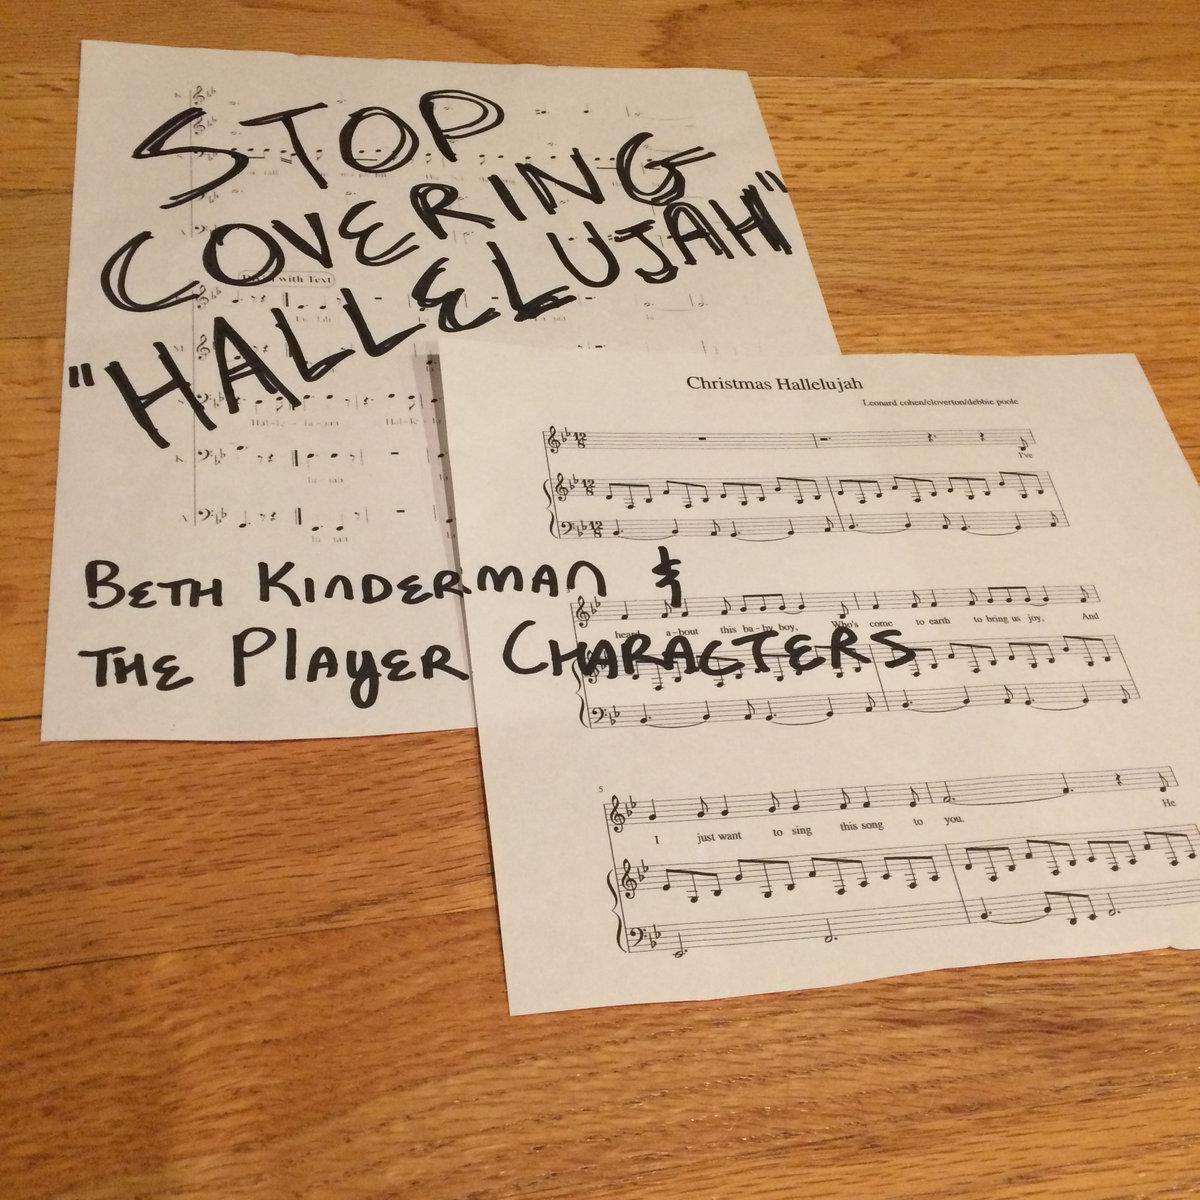 Hallelujah Christmas Lyrics.Stop Covering Hallelujah Uncensored Beth Kinderman